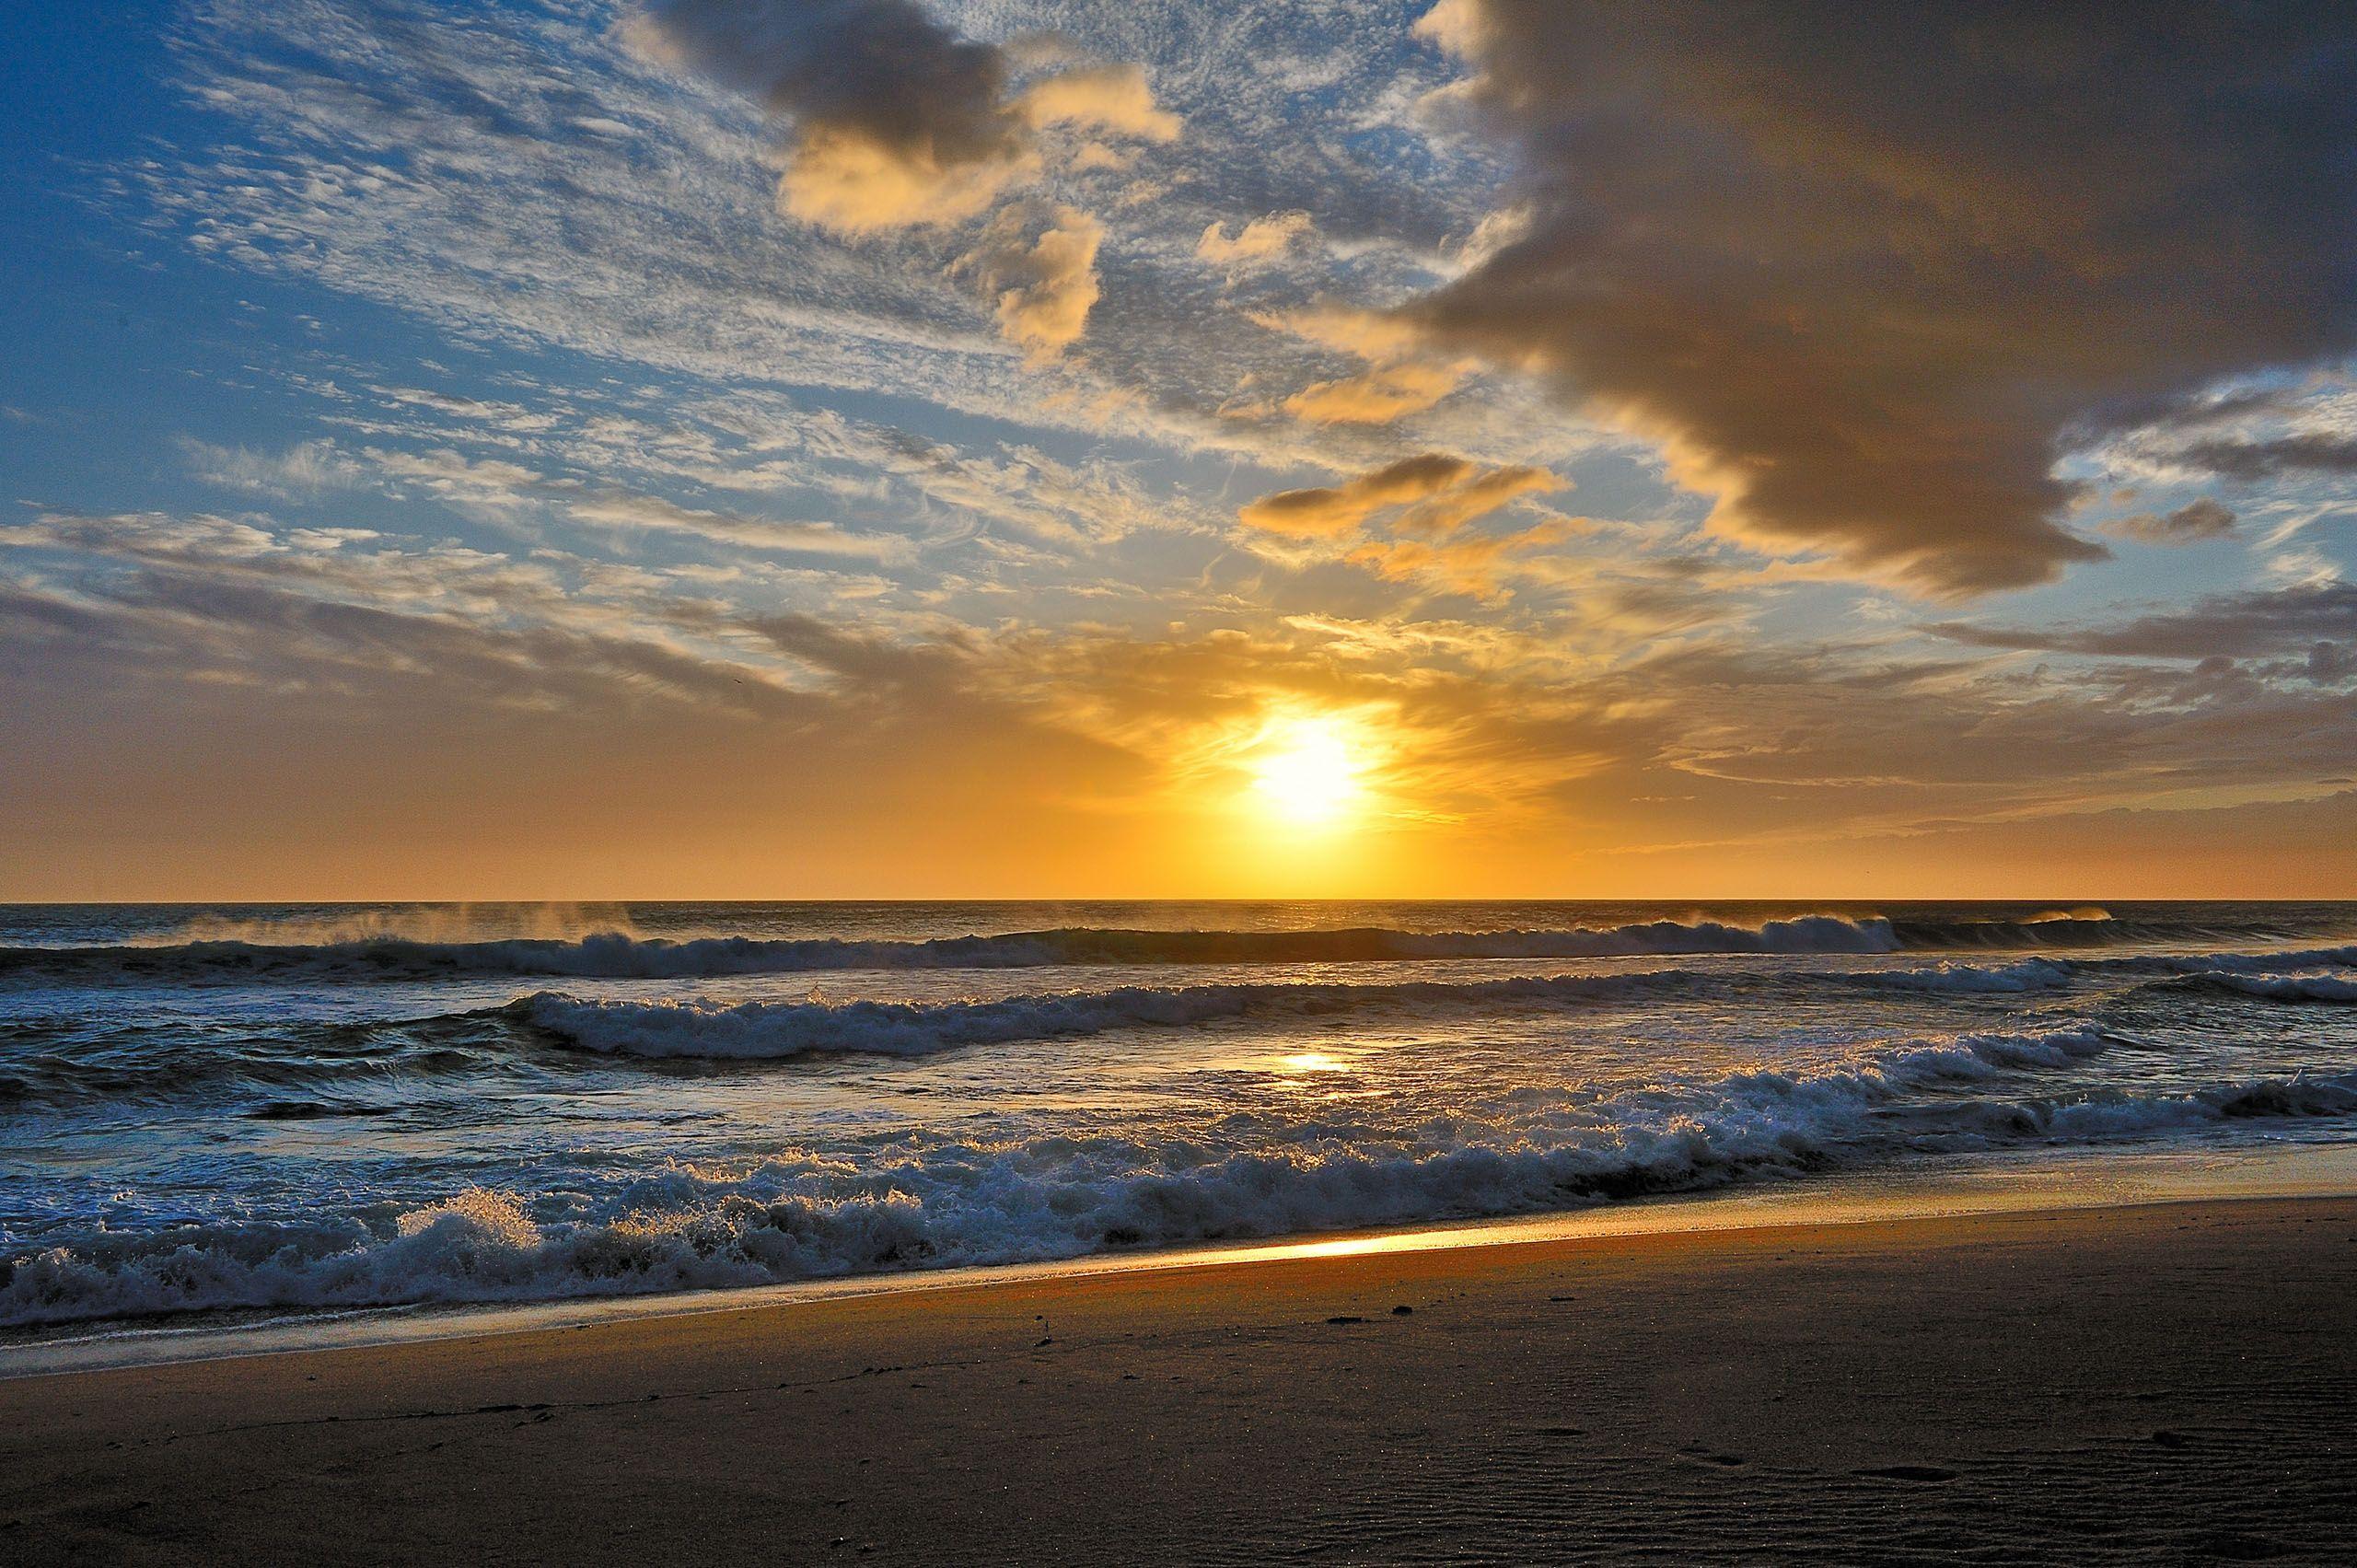 Pin By Marti On Beaches Sunset Wallpaper Beach